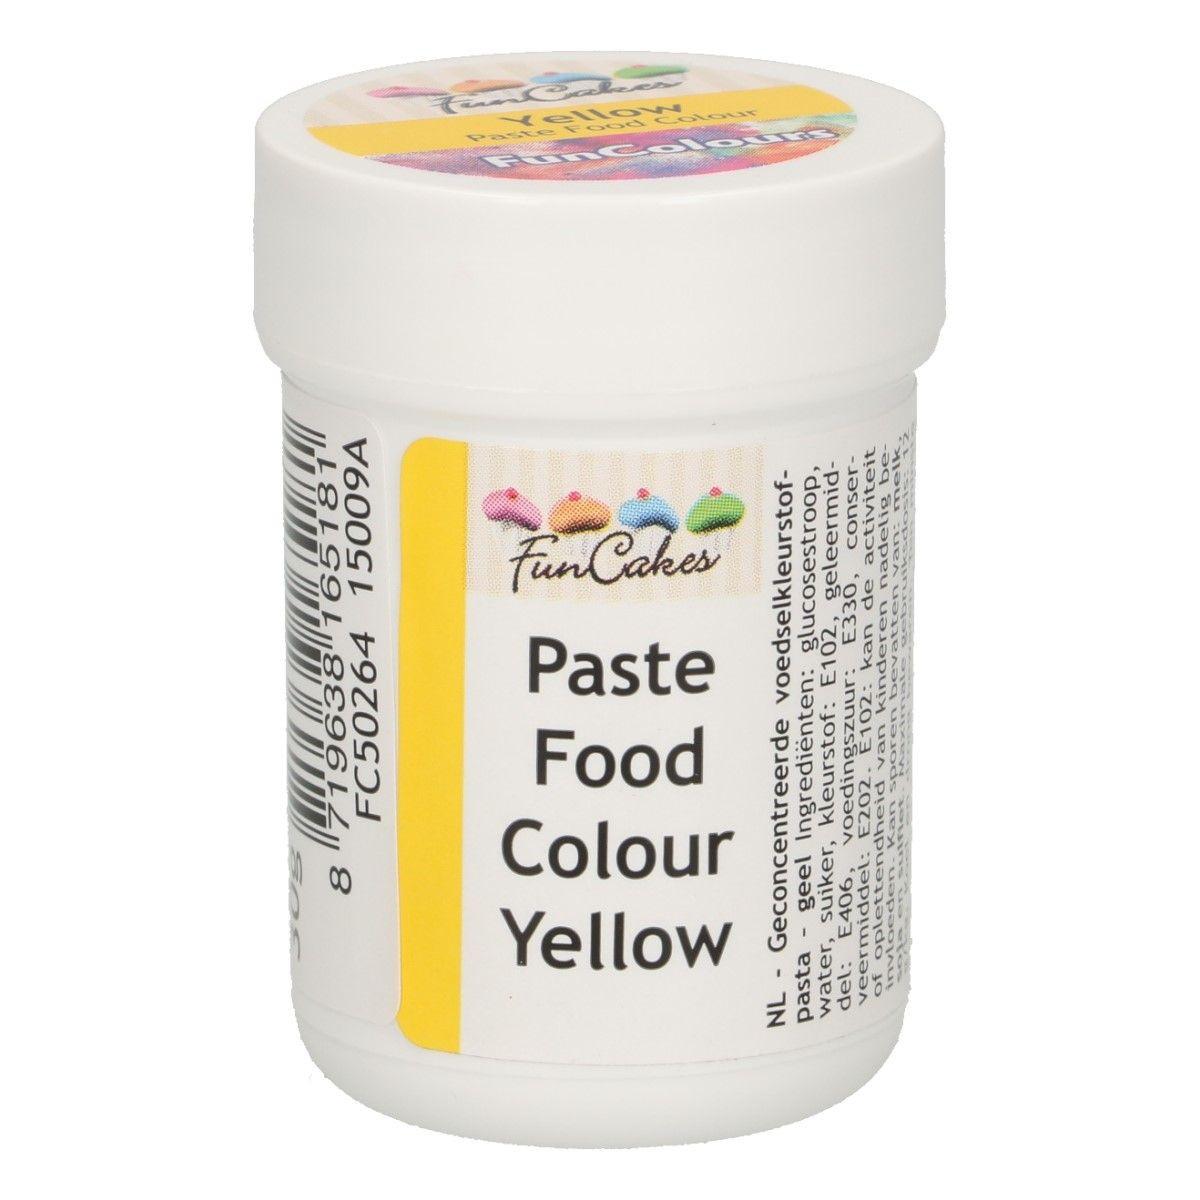 Funcakes FunColours Paste Food Colour - Yellow/Gelb 30 g